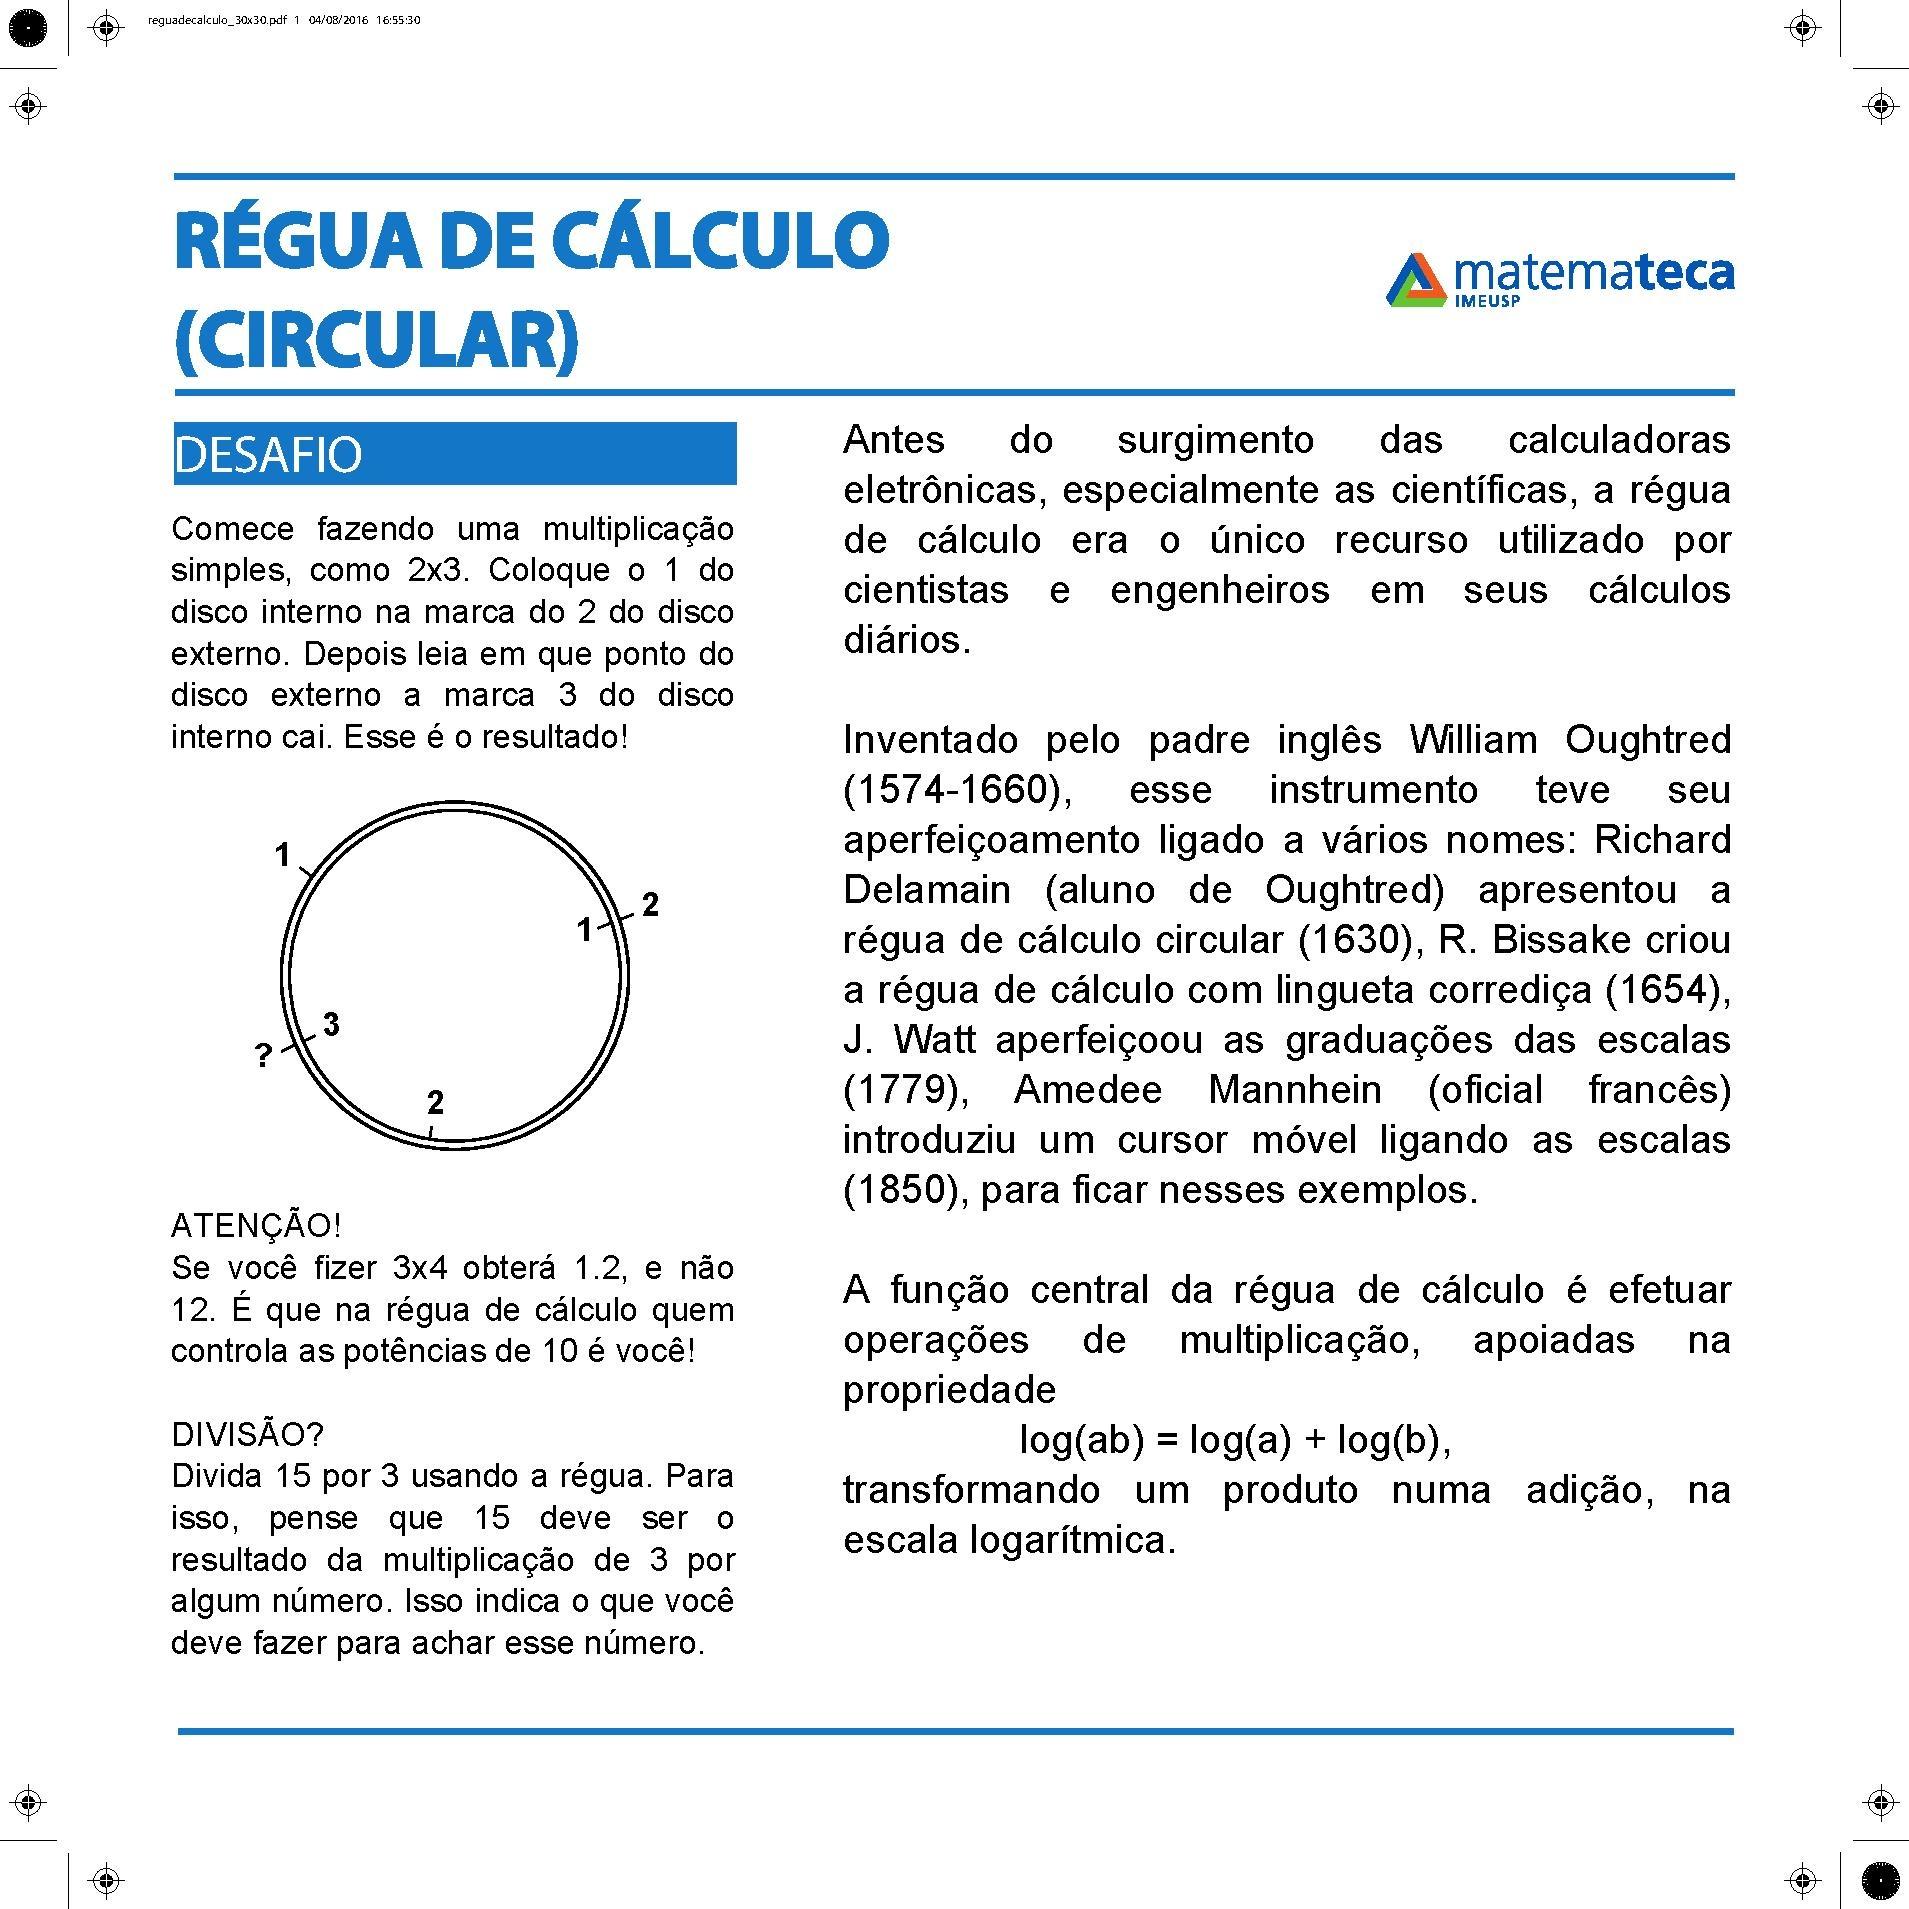 43b655f55b886 File Régua de cálculo circular banner.pdf - Wikimedia Commons